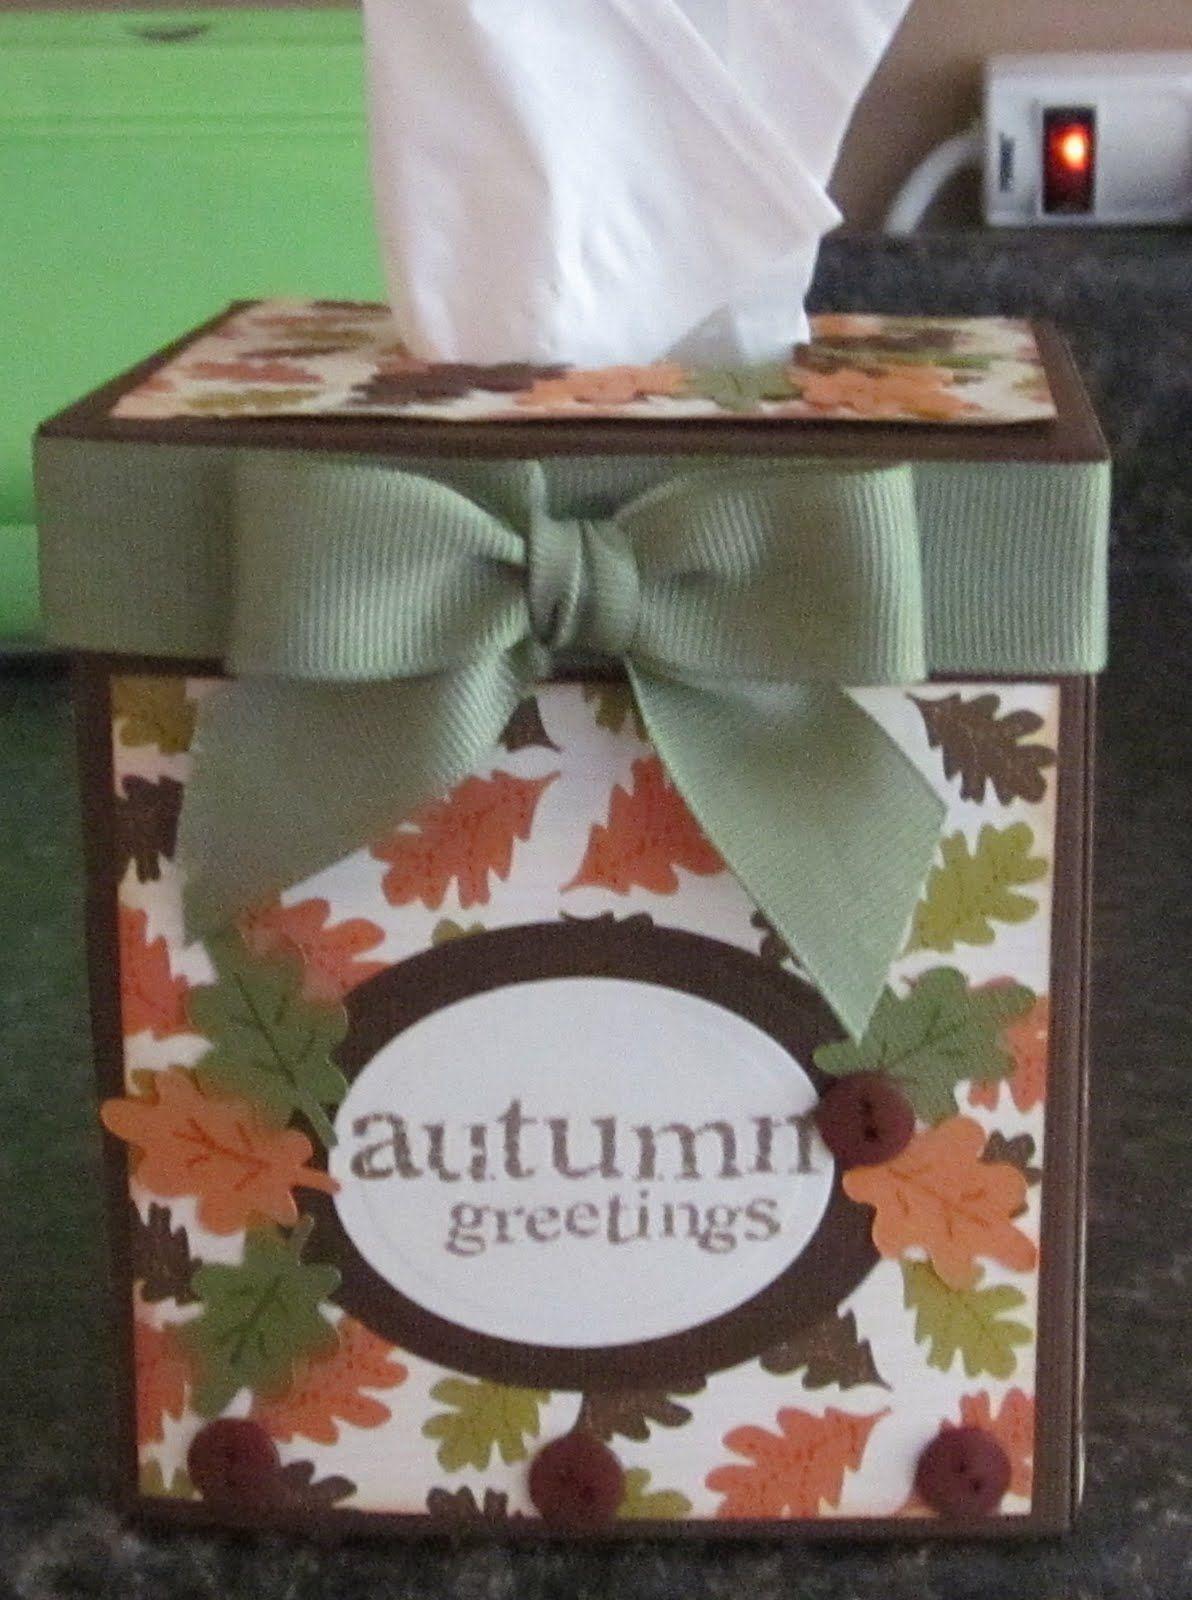 Tissue box cover craft ideas pinterest tissue box for Tissue box cover craft